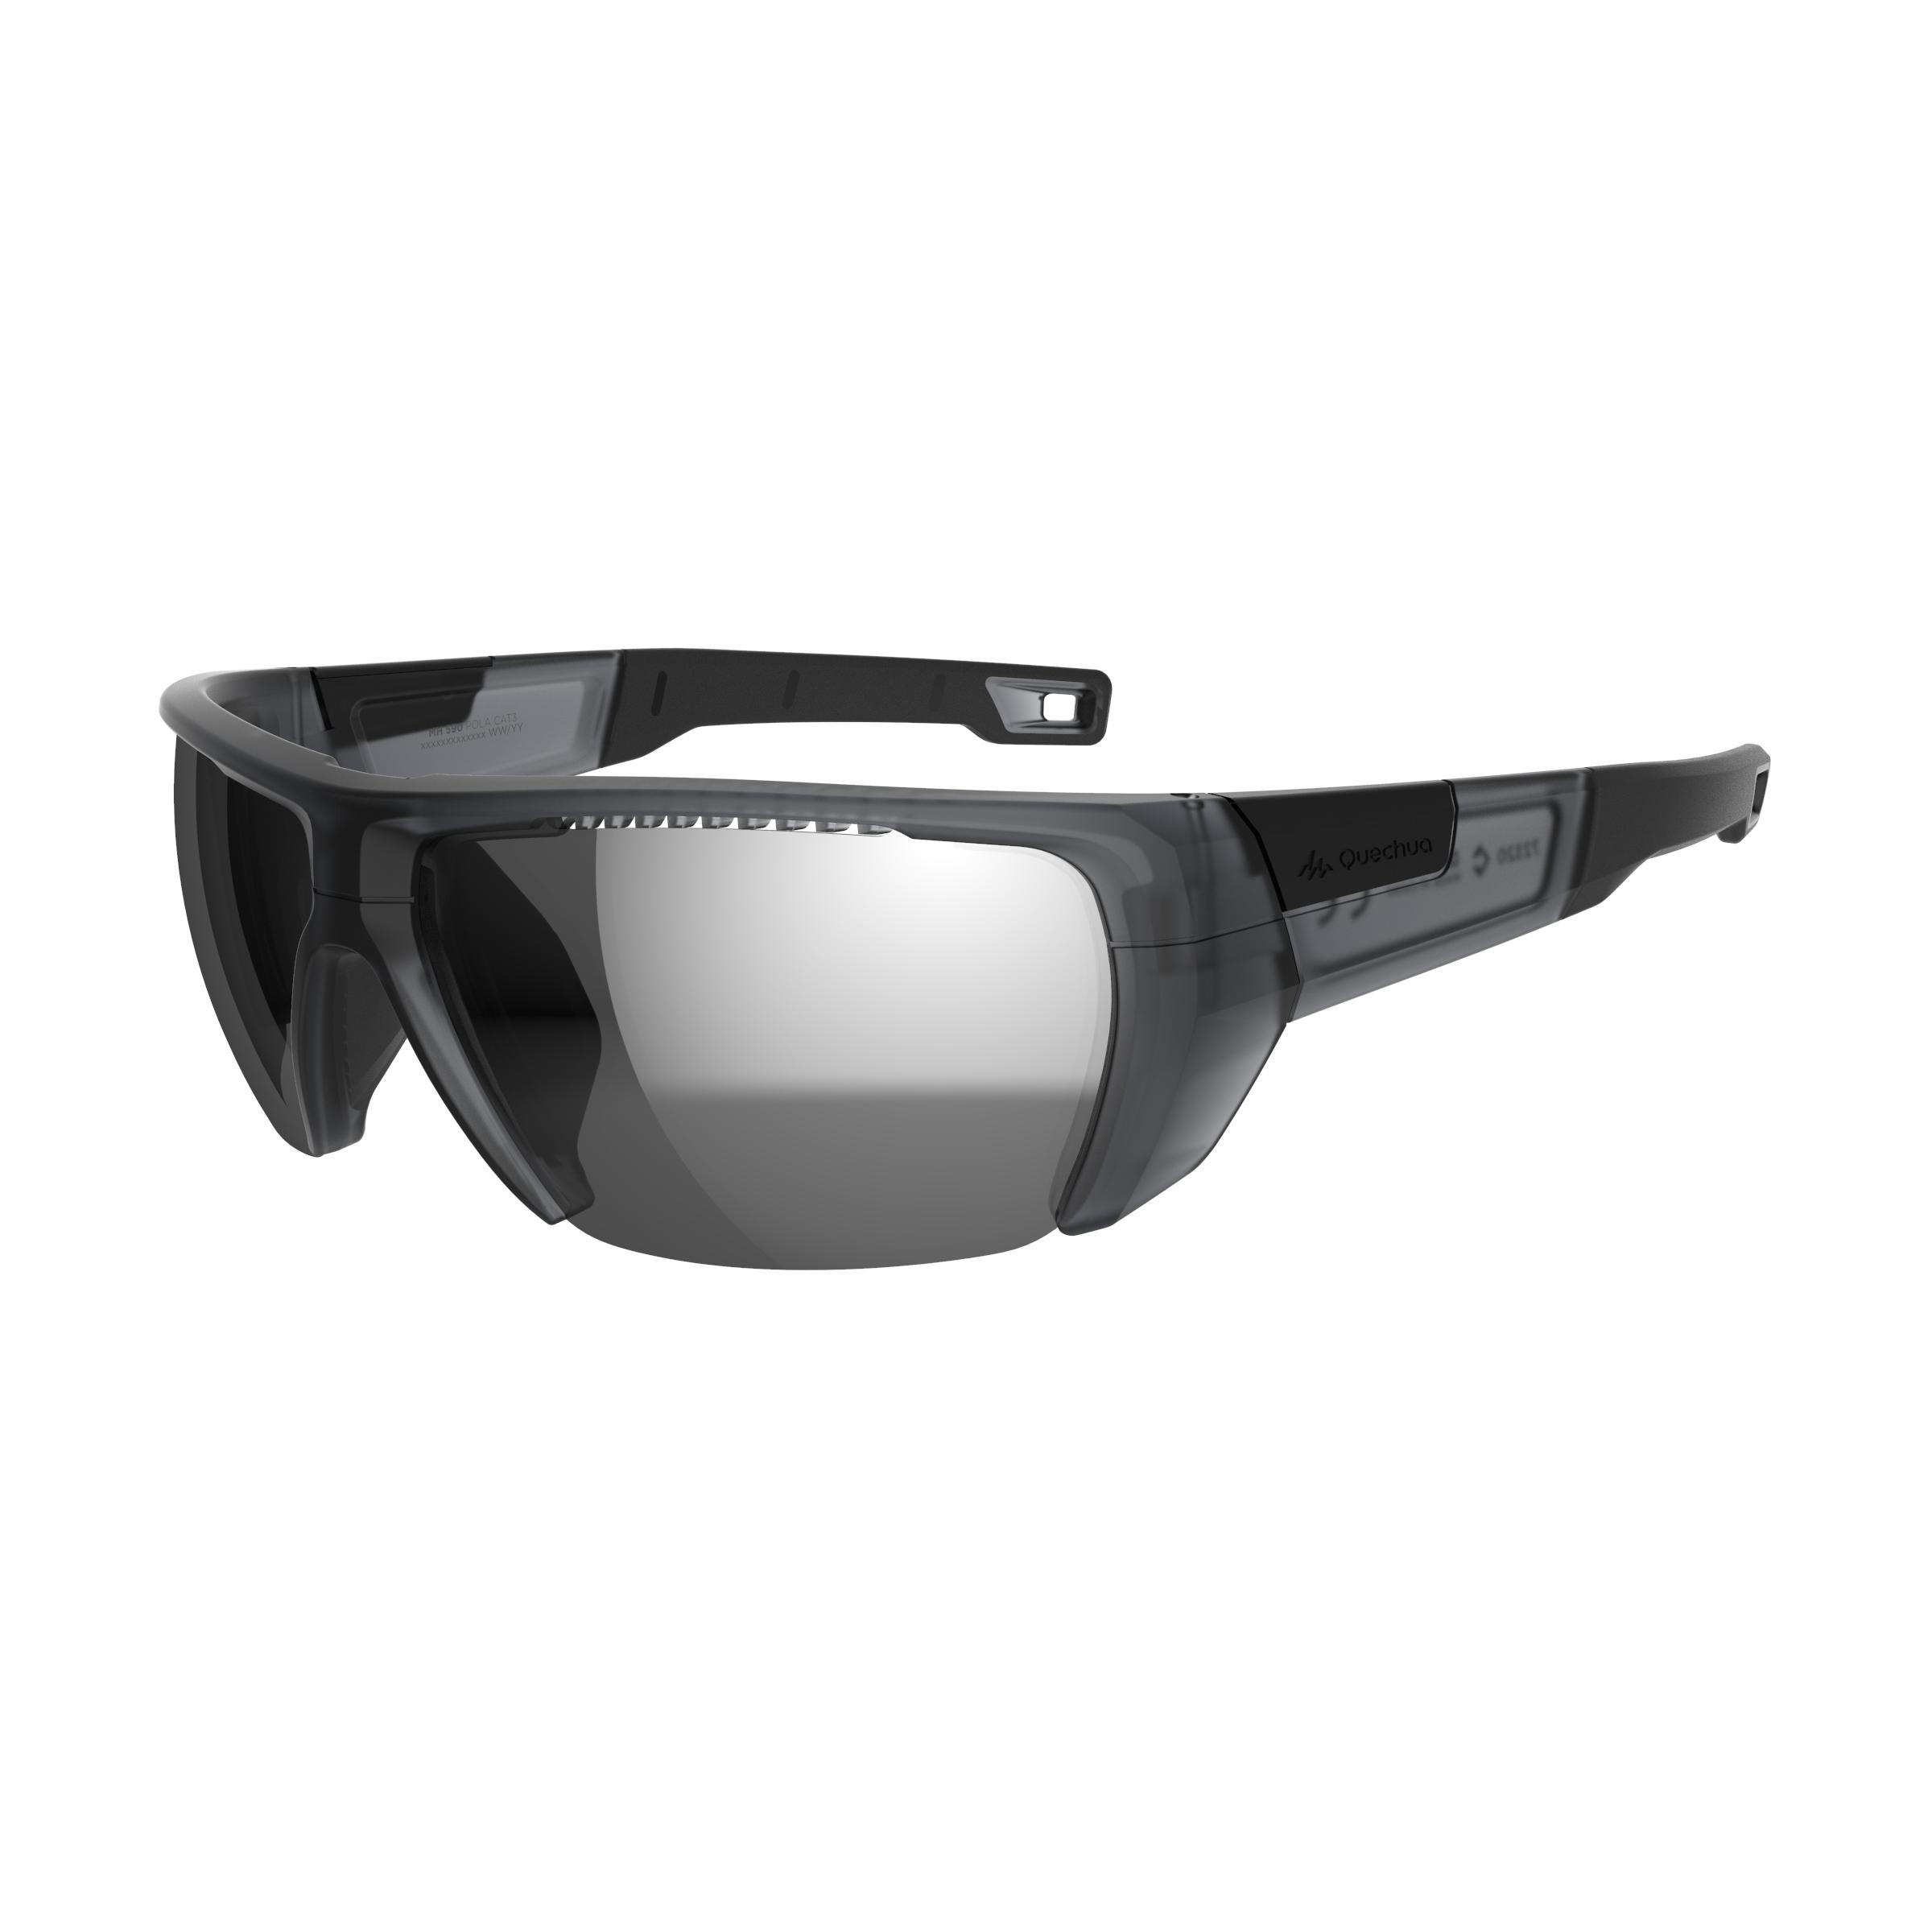 Ochelari MH590 POLA CAT4 la Reducere poza